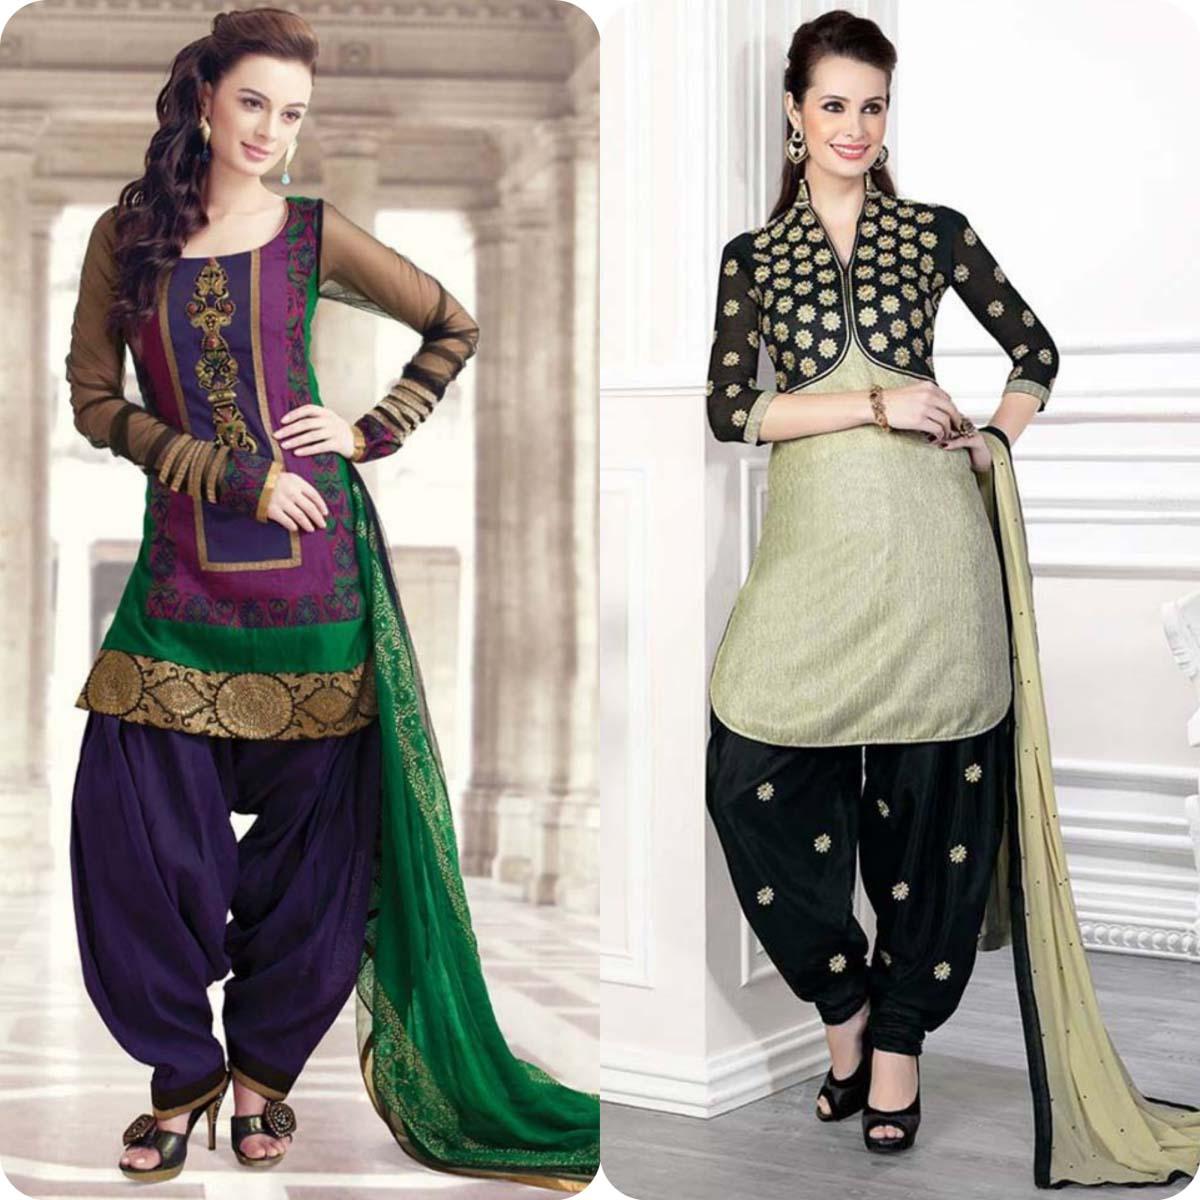 Latest Pakistani and Indian Patiala Shalwar Kameez Suits Designs (13)